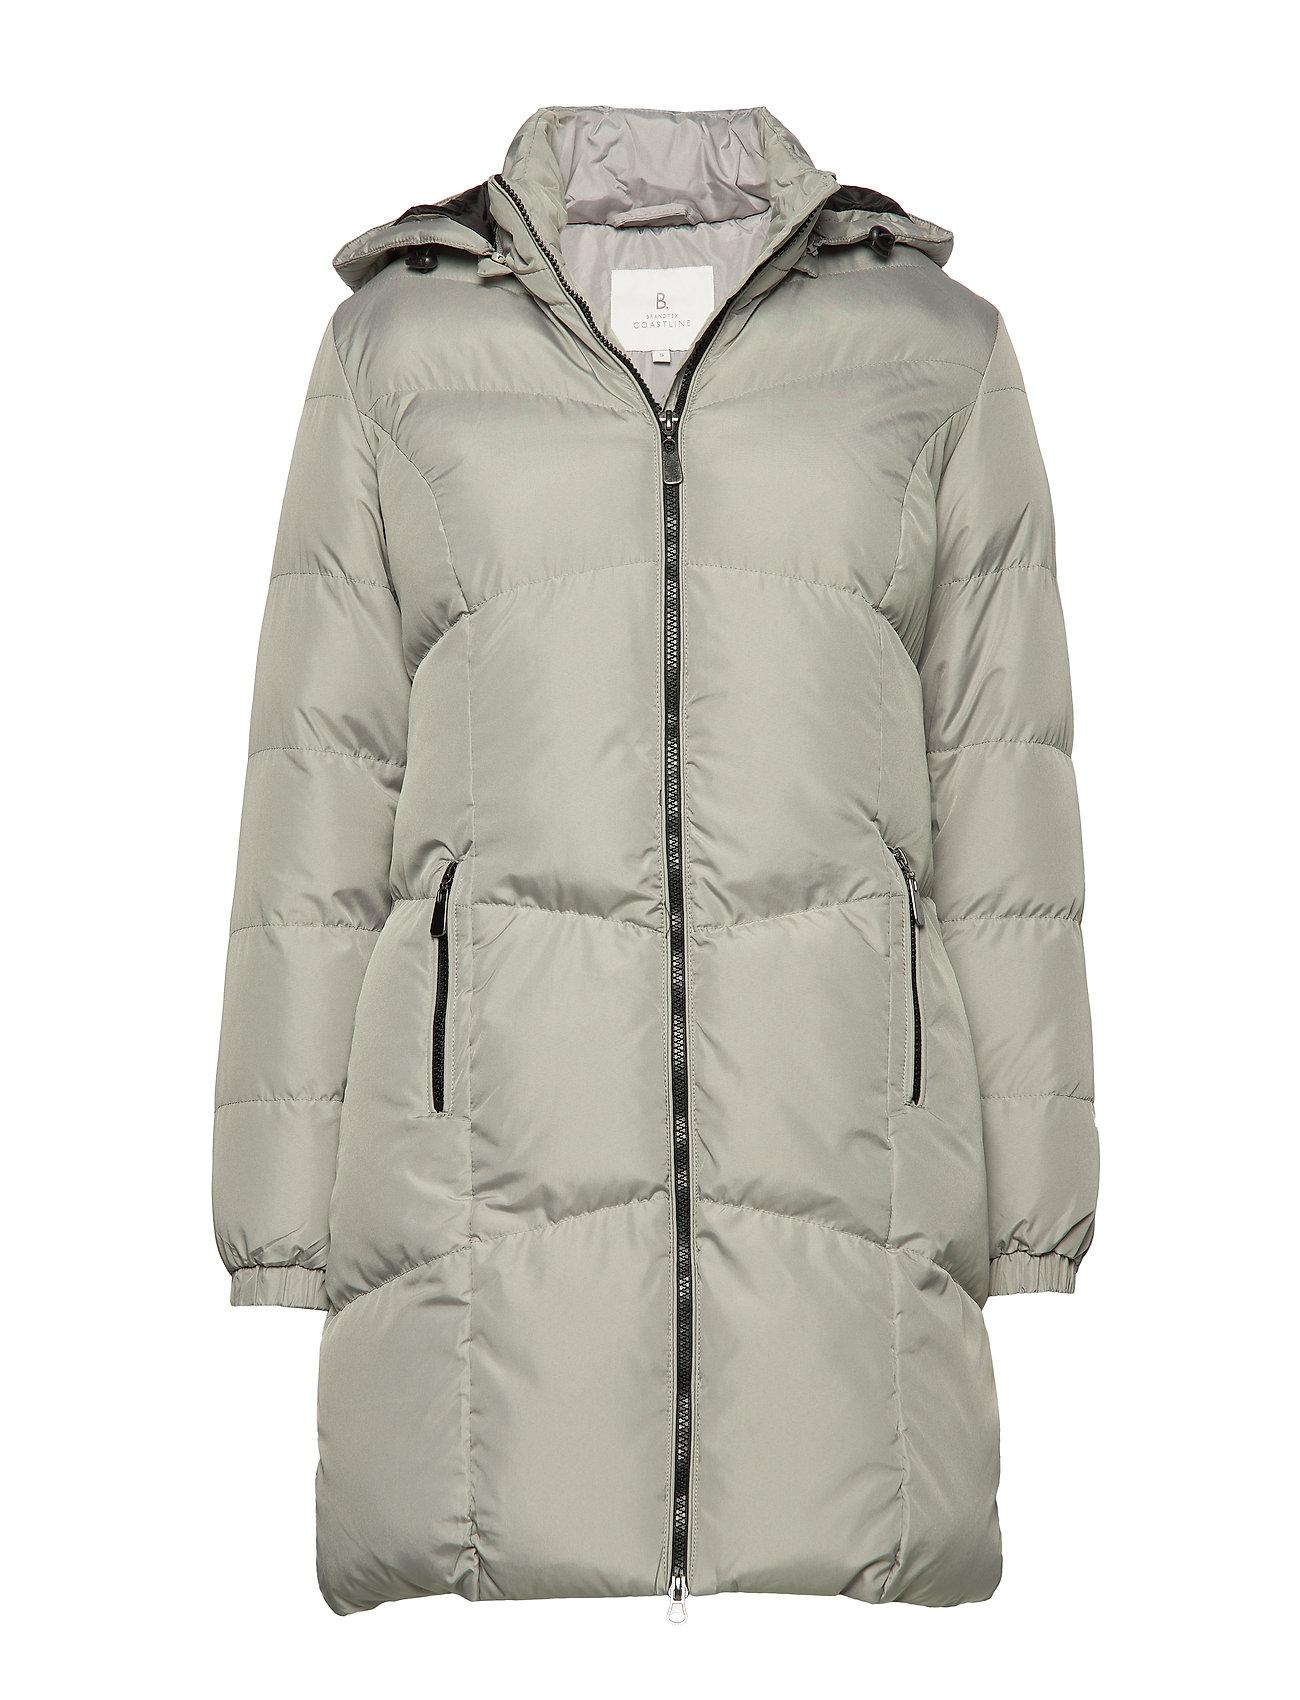 Brandtex Coat Outerwear Heavy - WILD DOVE